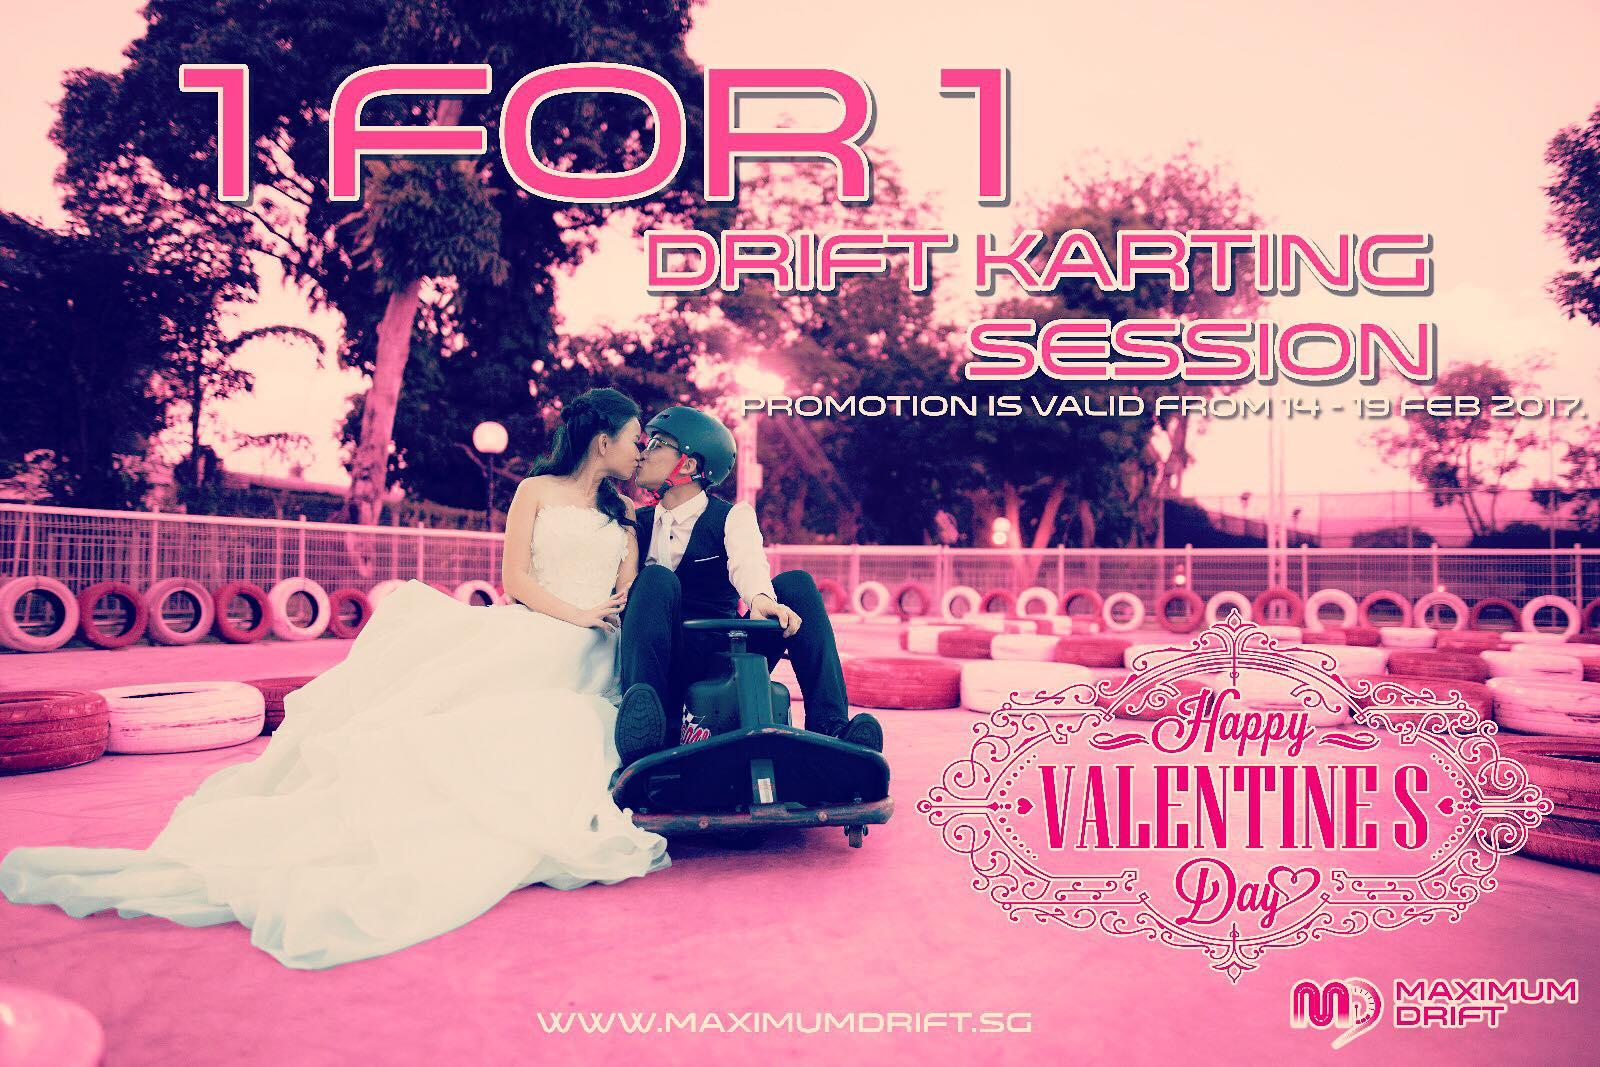 Valentine's Day Promo!